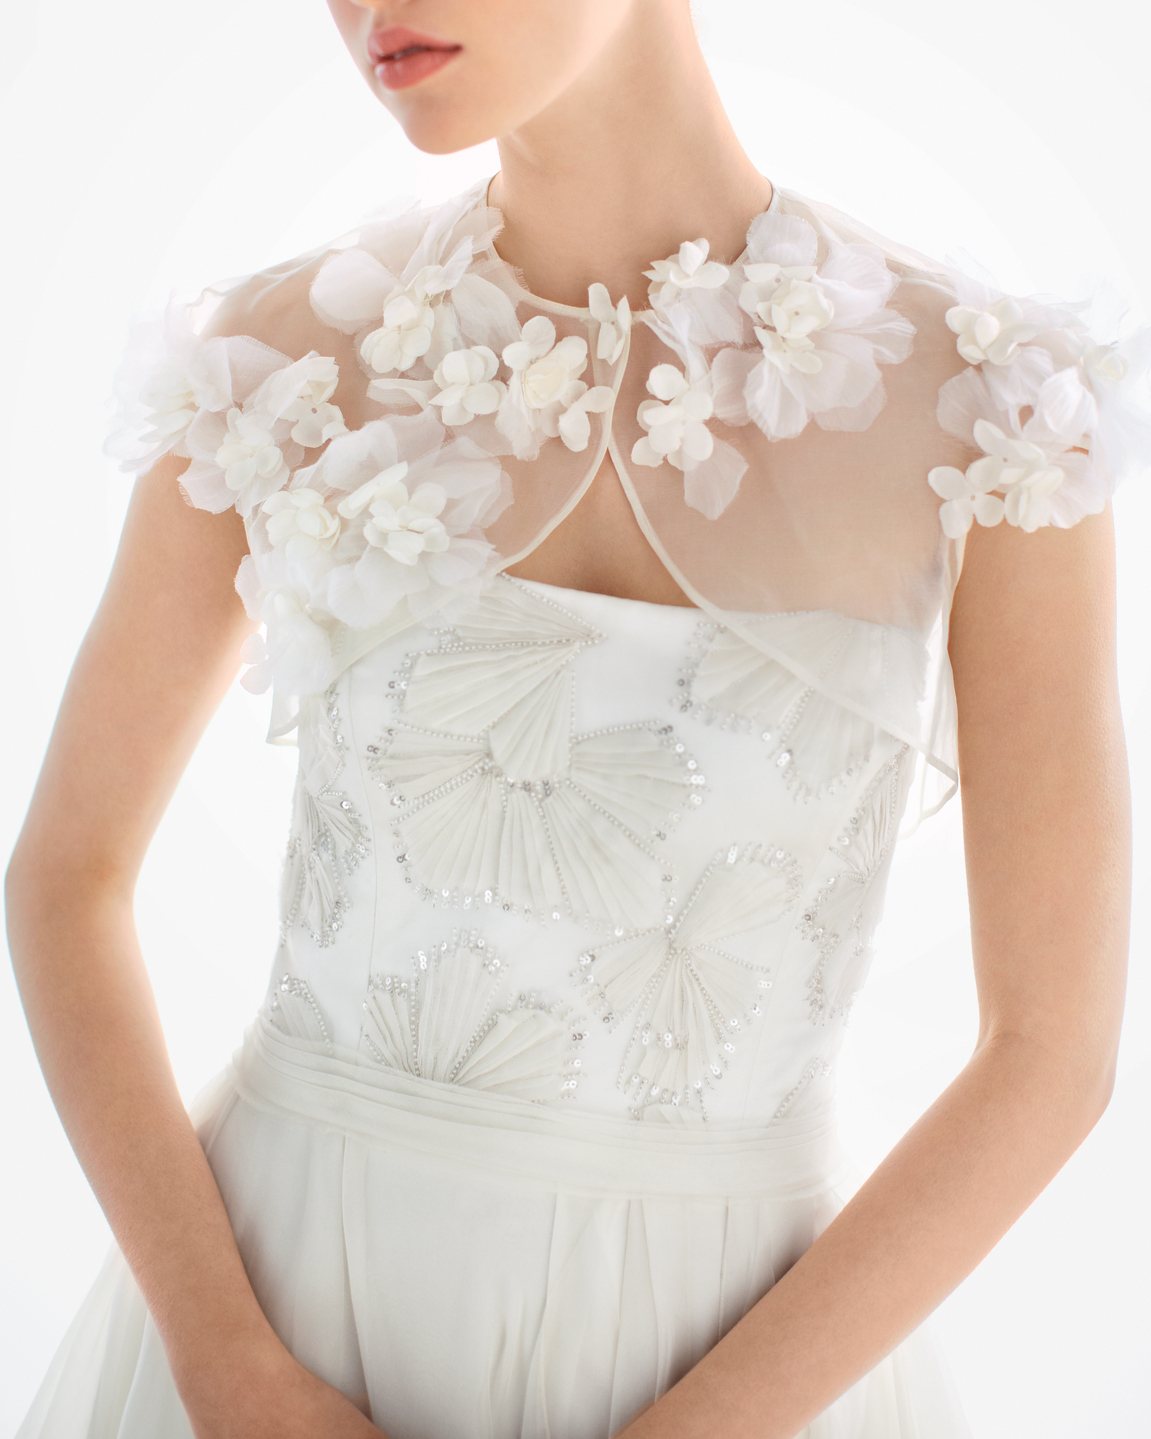 bride-shrugs-b-mwd108762.jpg